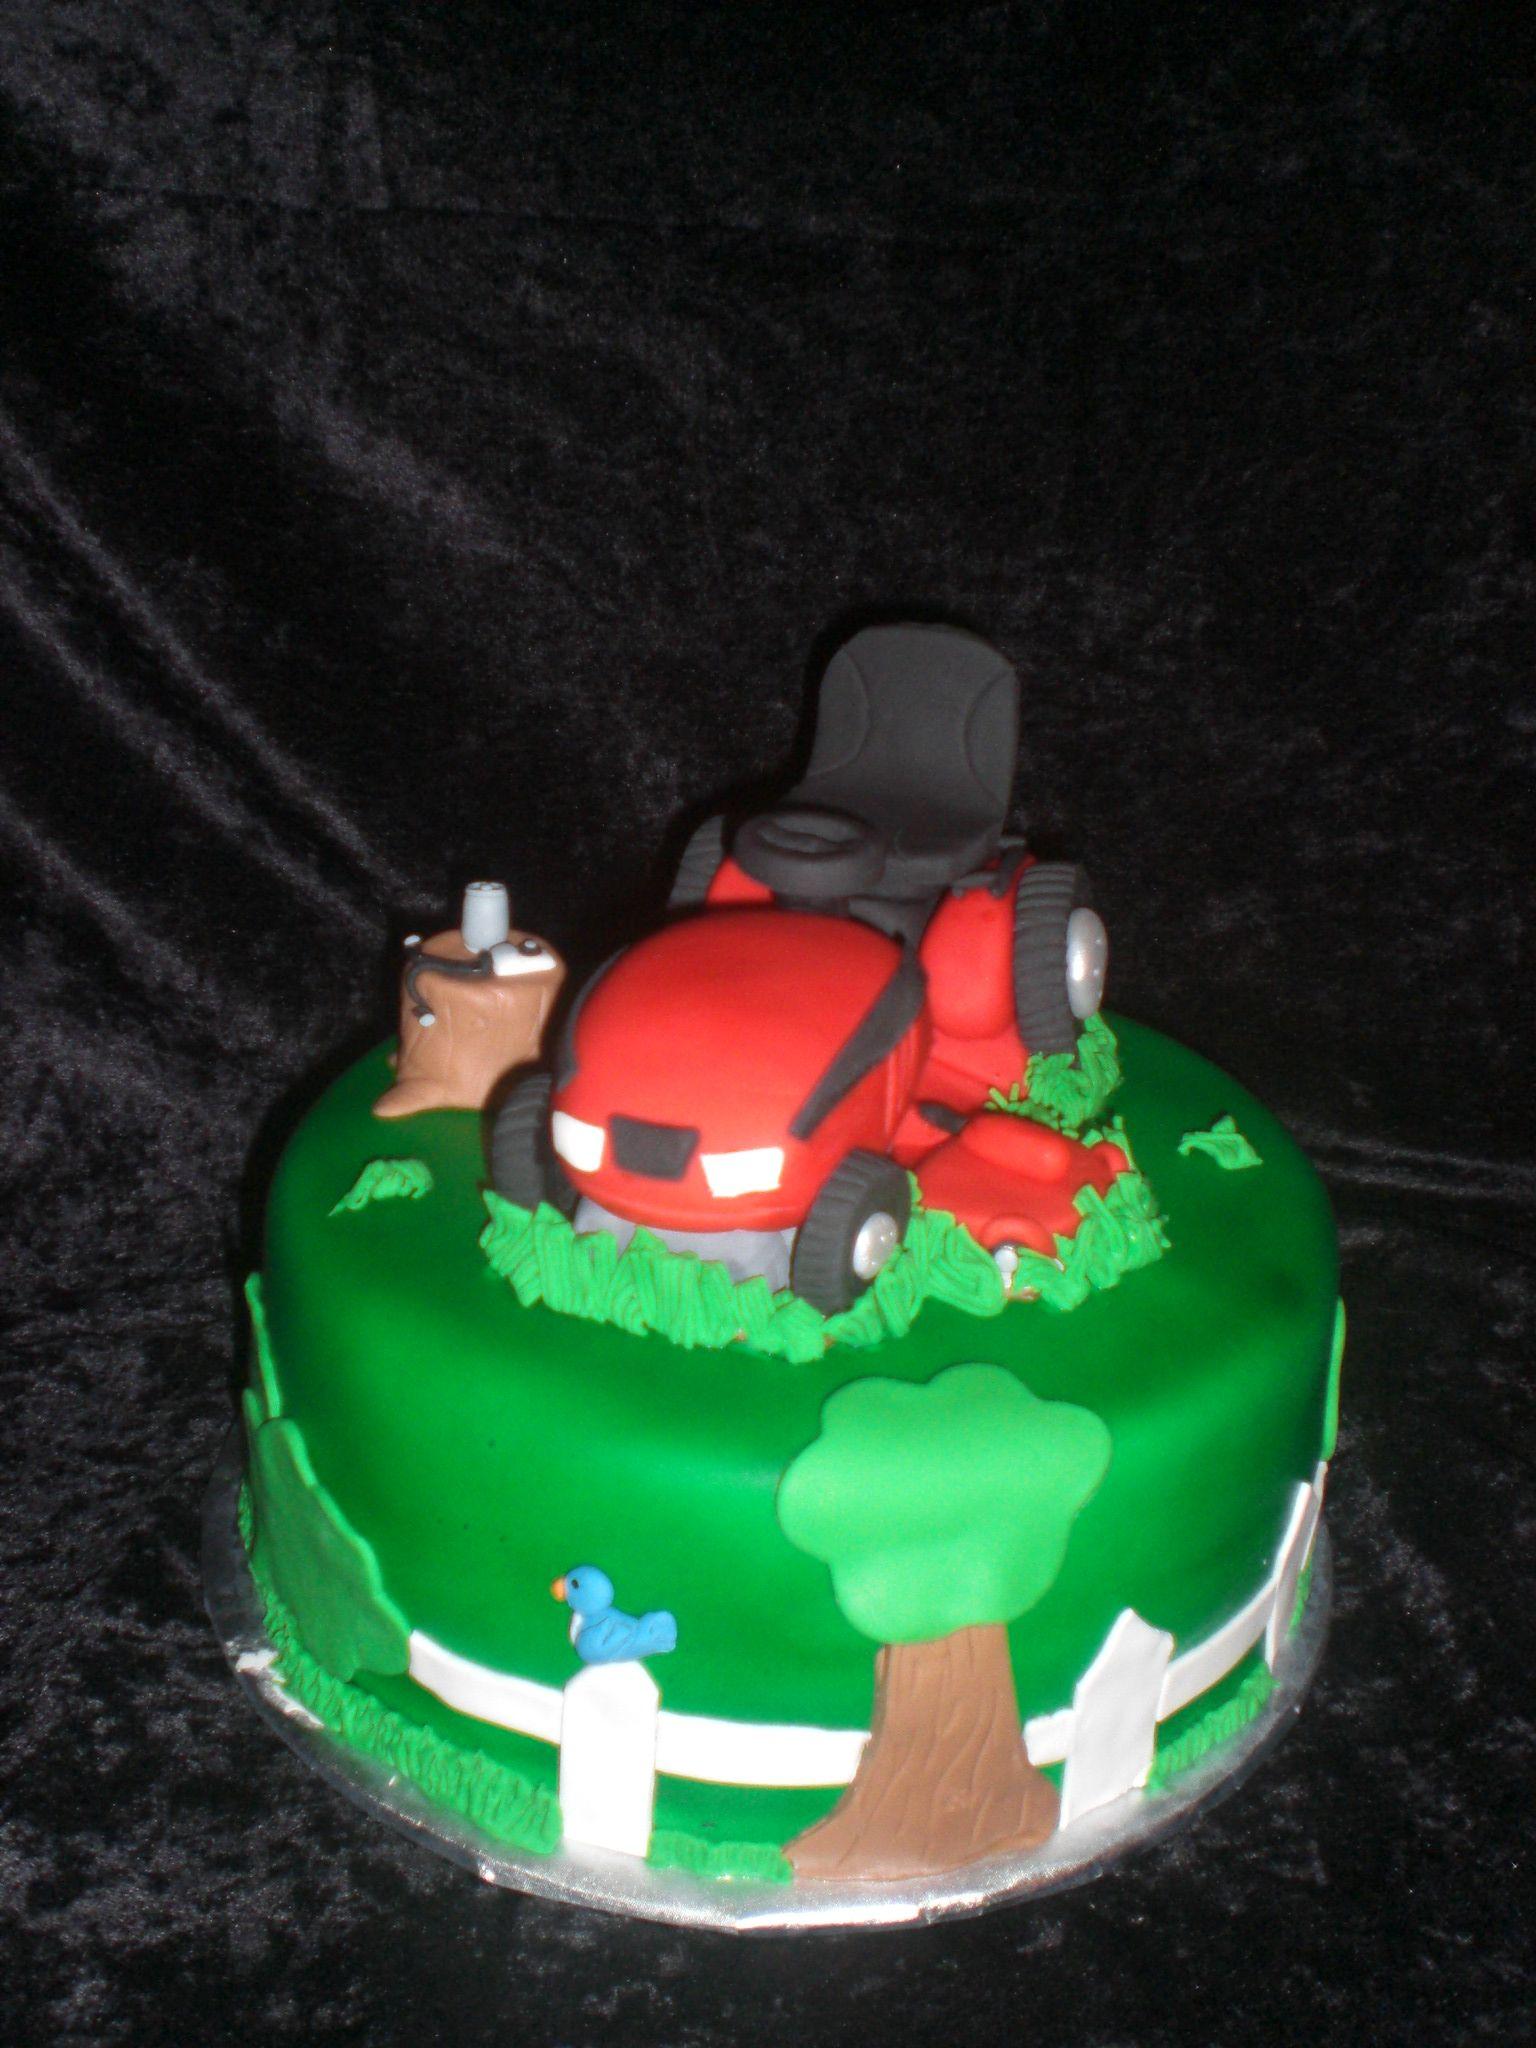 Riding Lawn Mower Cake | Lawn mower cake, Riding lawn ...